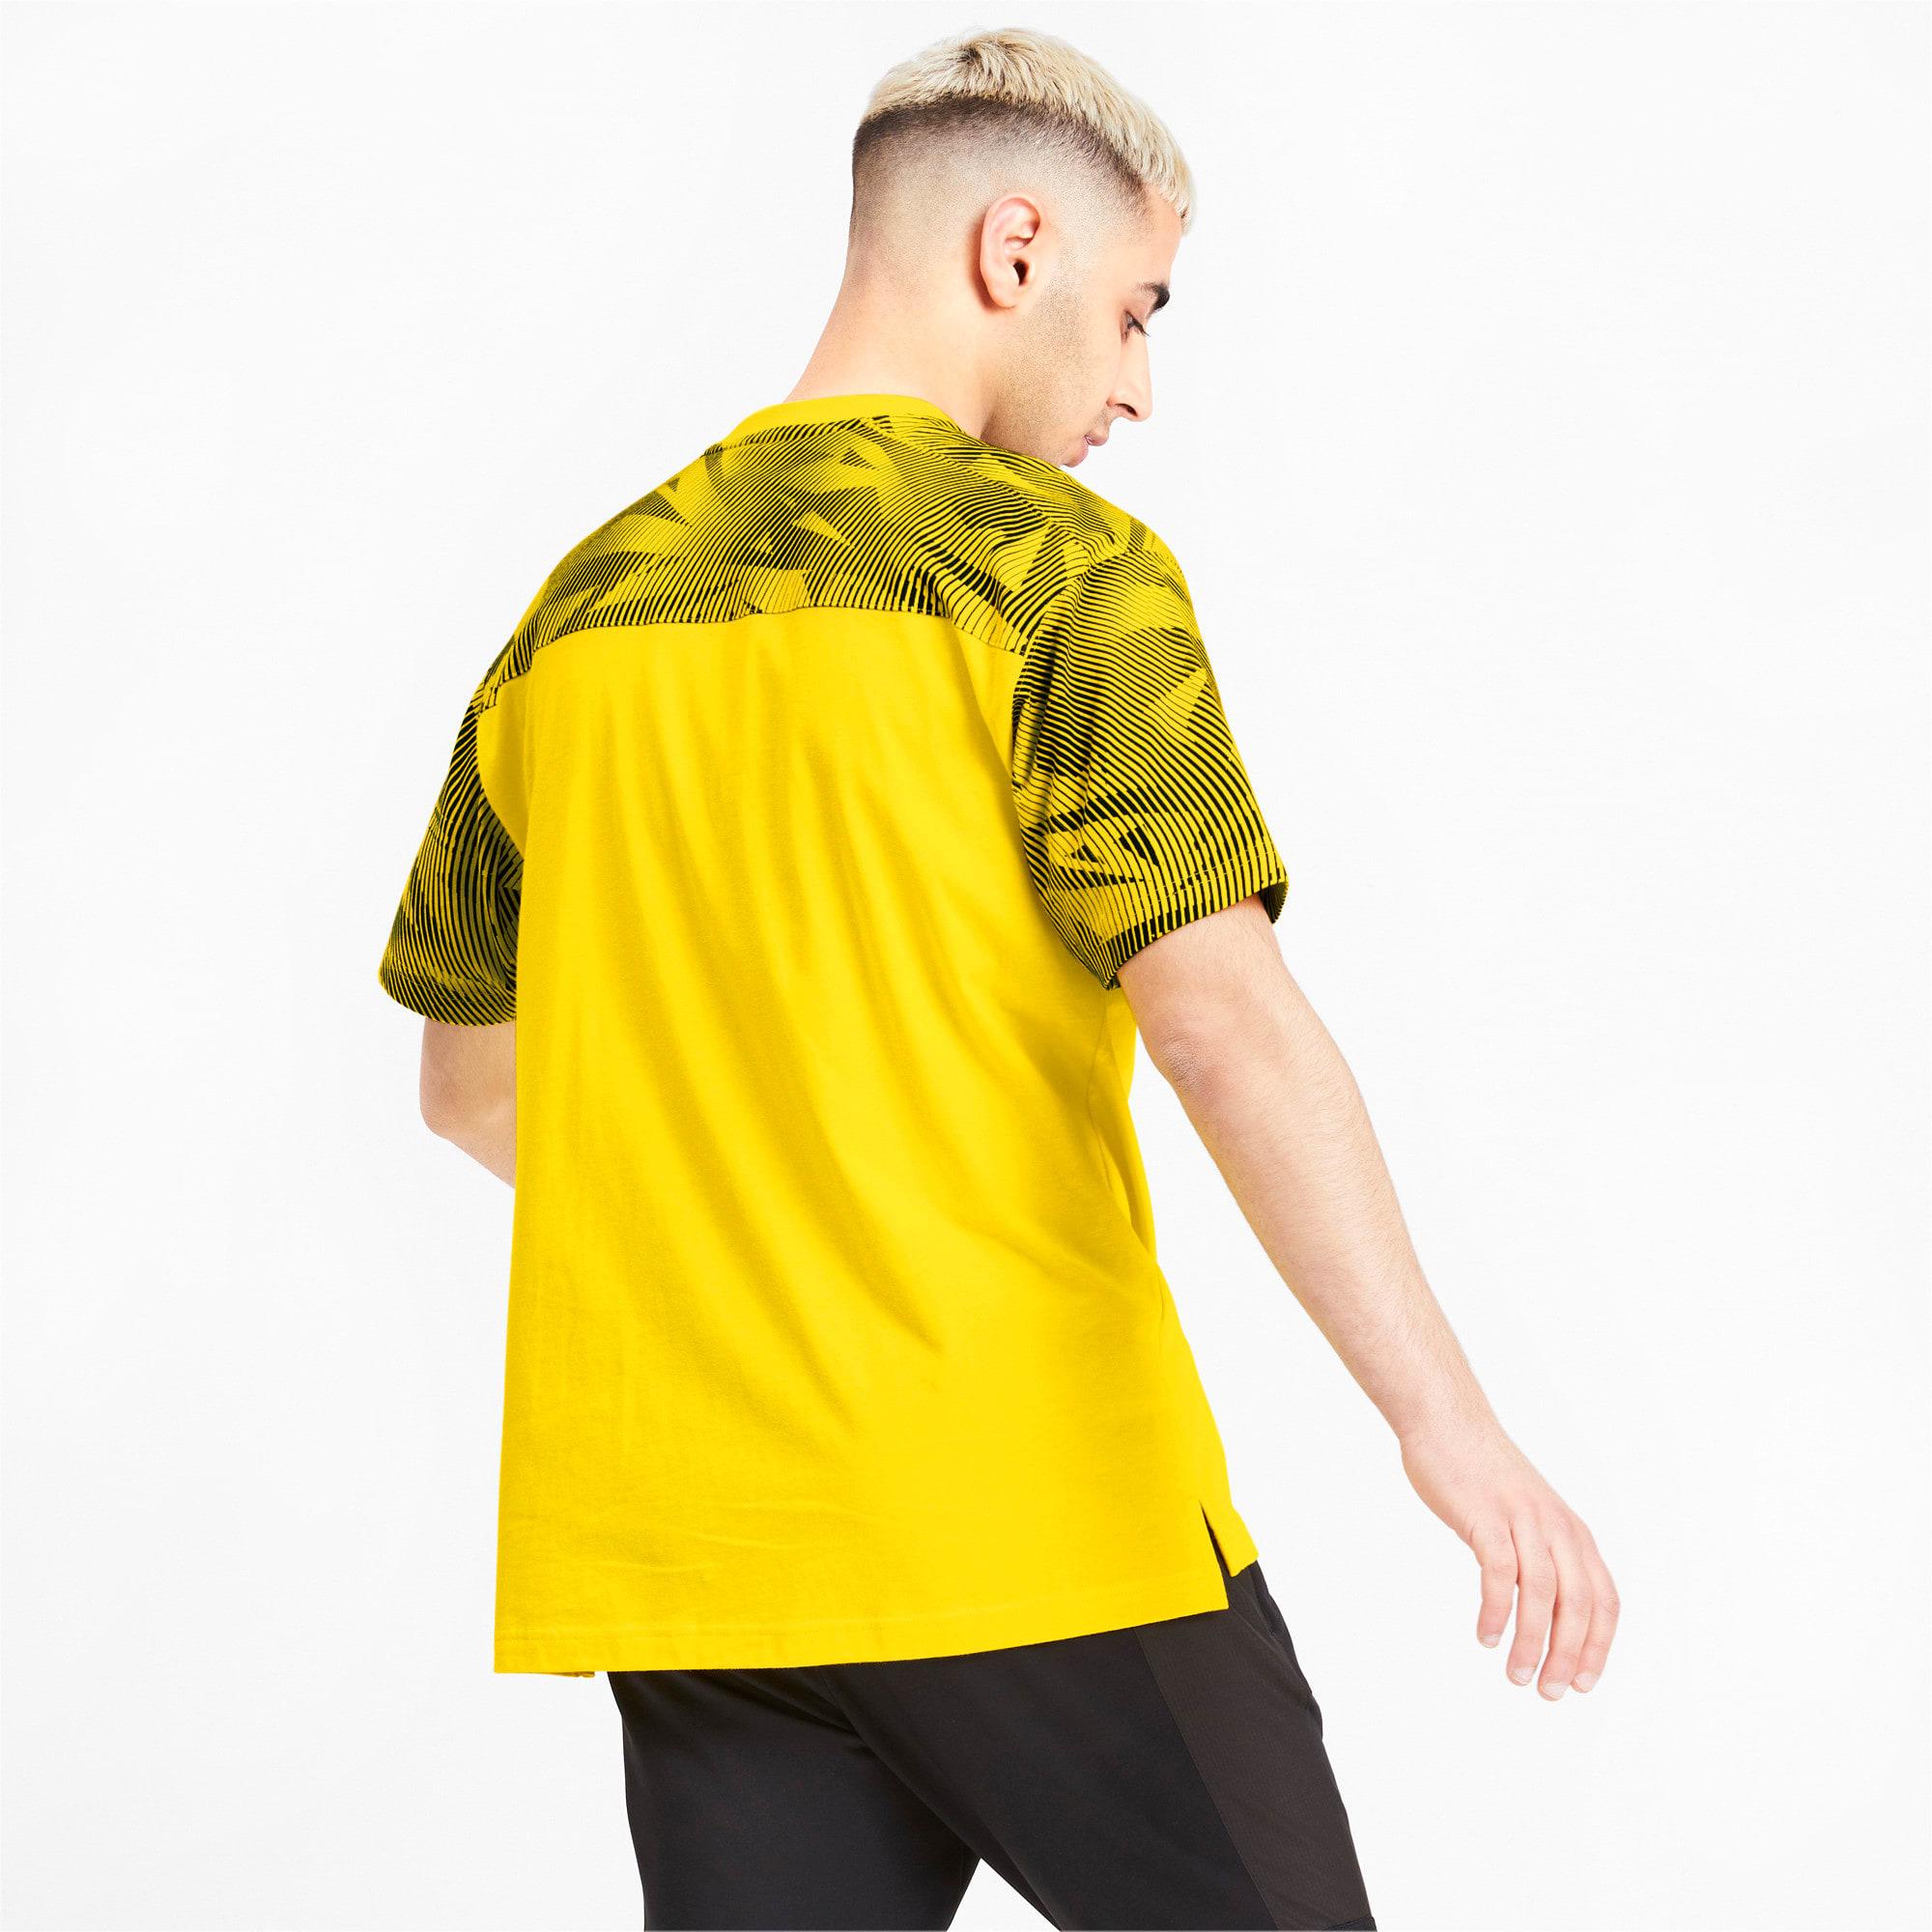 Thumbnail 2 of BVB Casuals Men's Tee, Cyber Yellow-Puma Black, medium